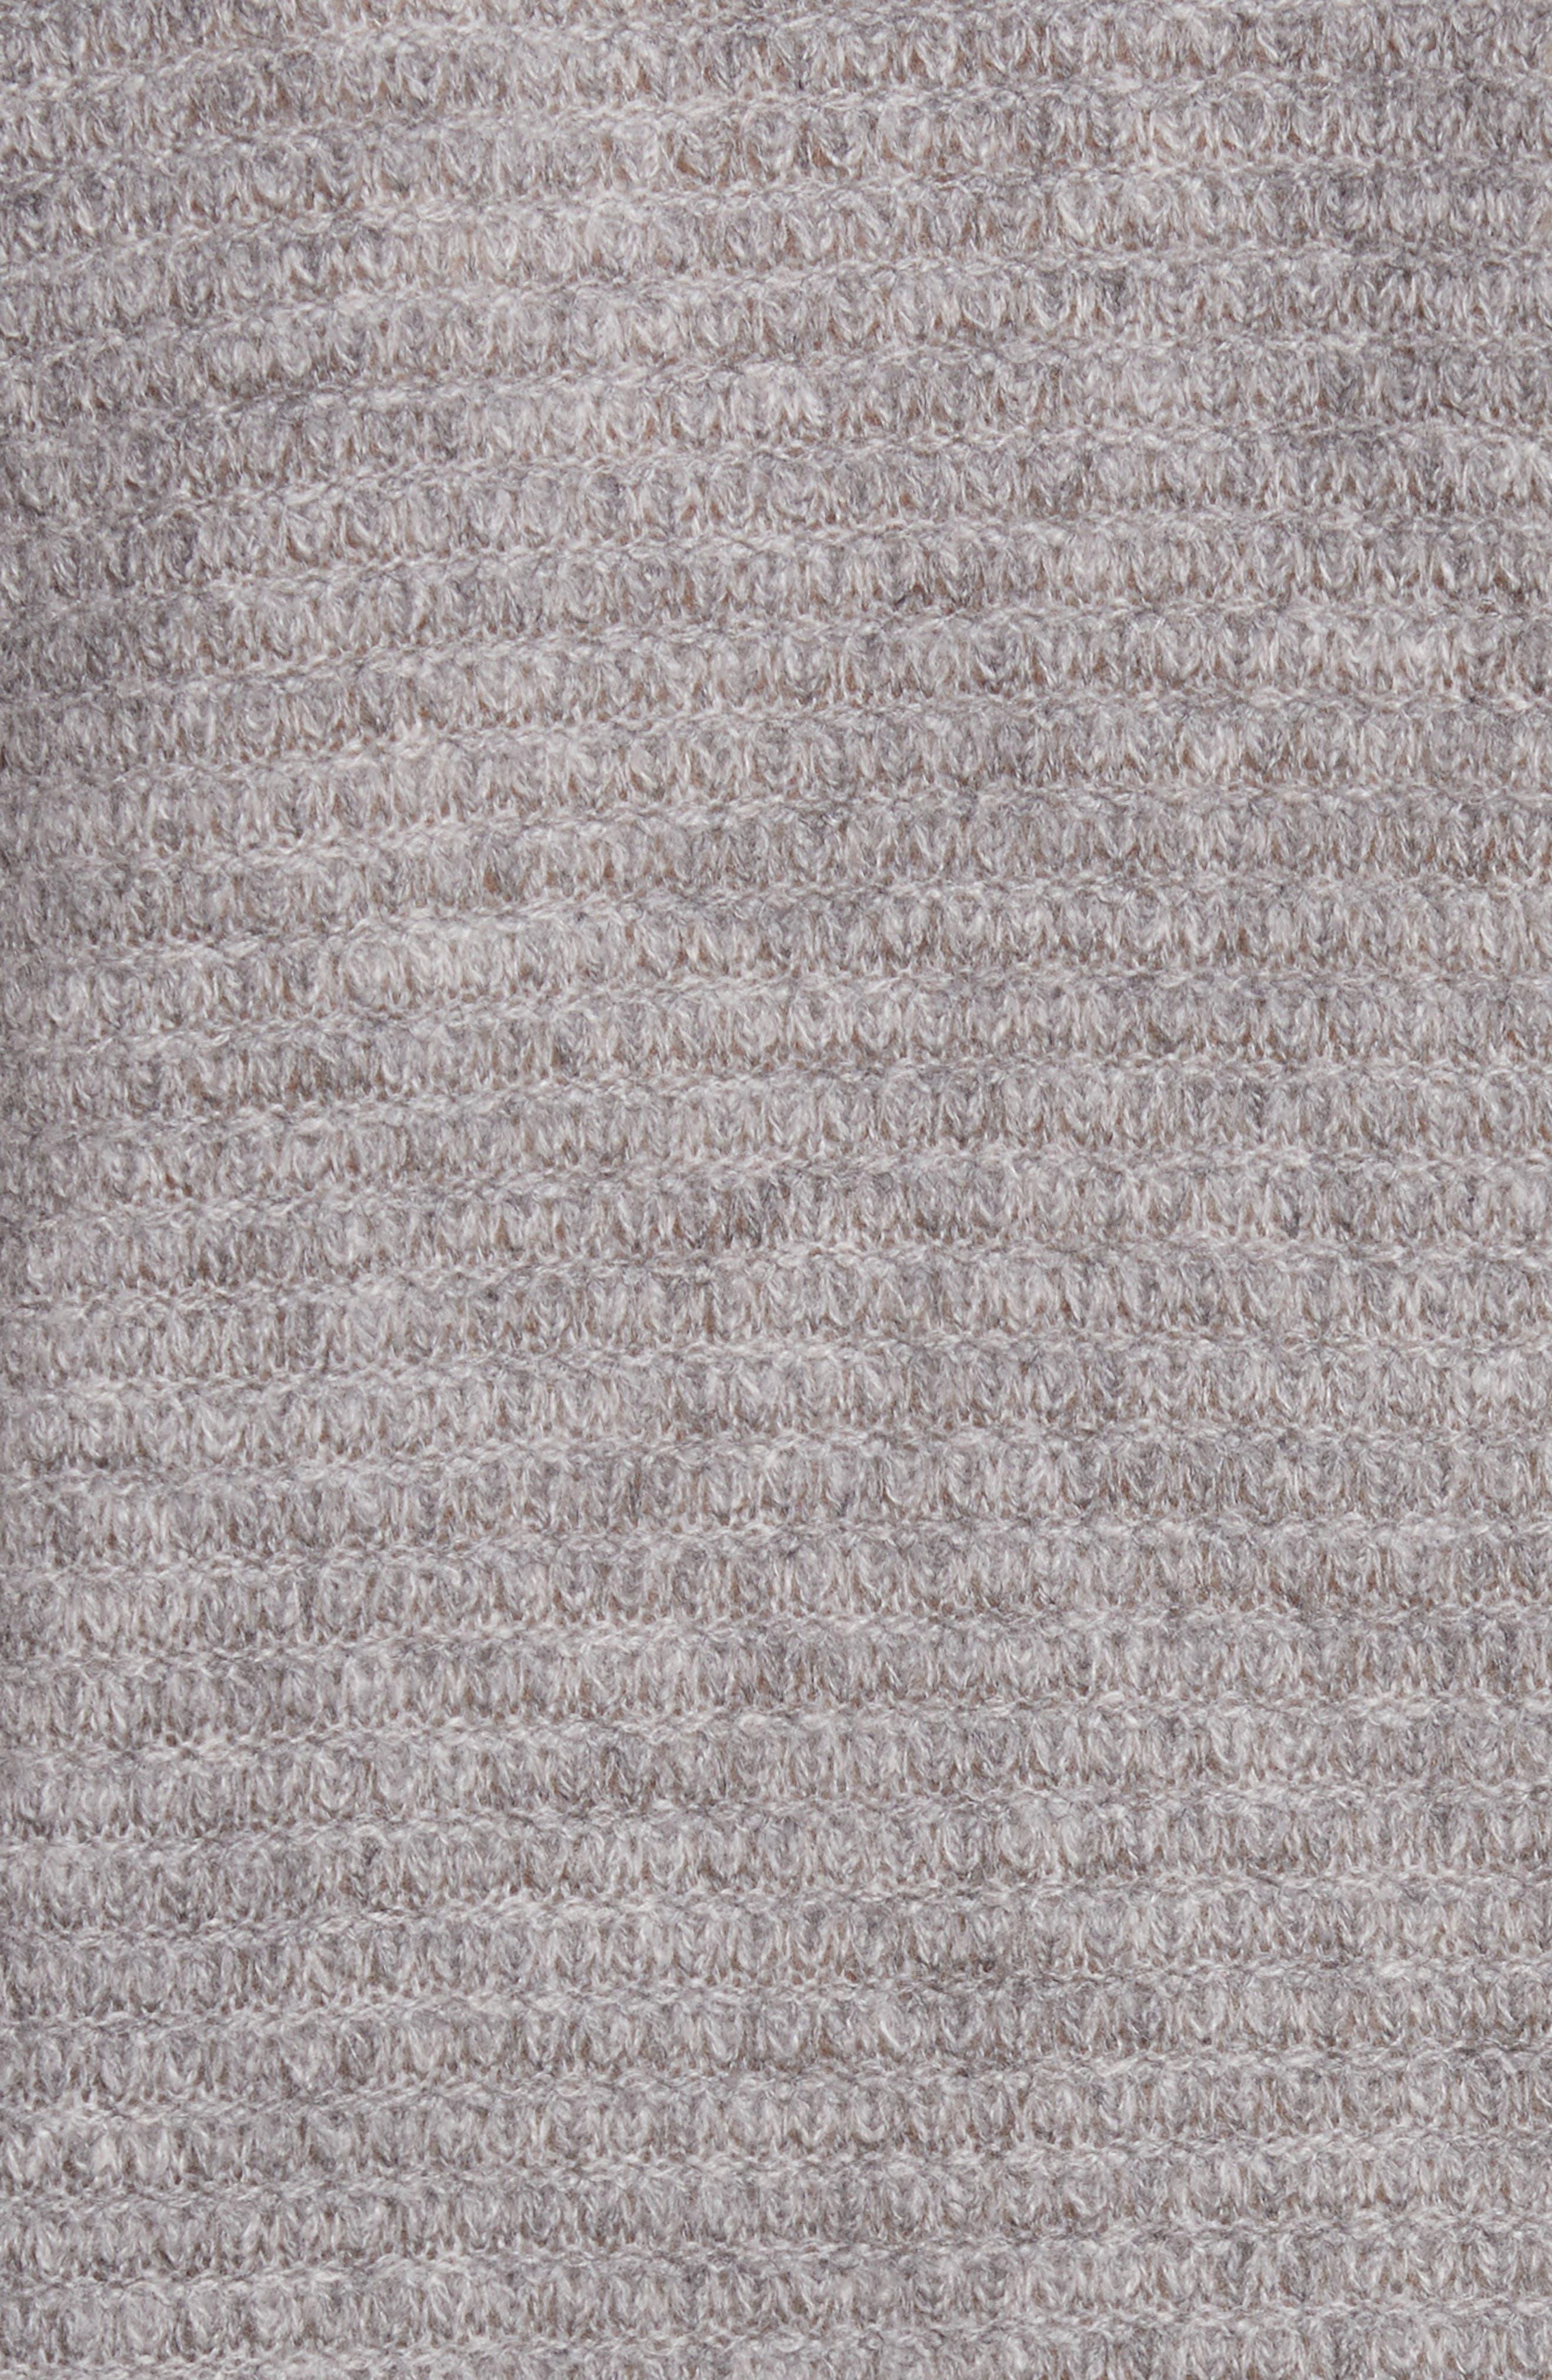 Cashmere V-Neck Sweater,                             Alternate thumbnail 5, color,                             Grey Marl